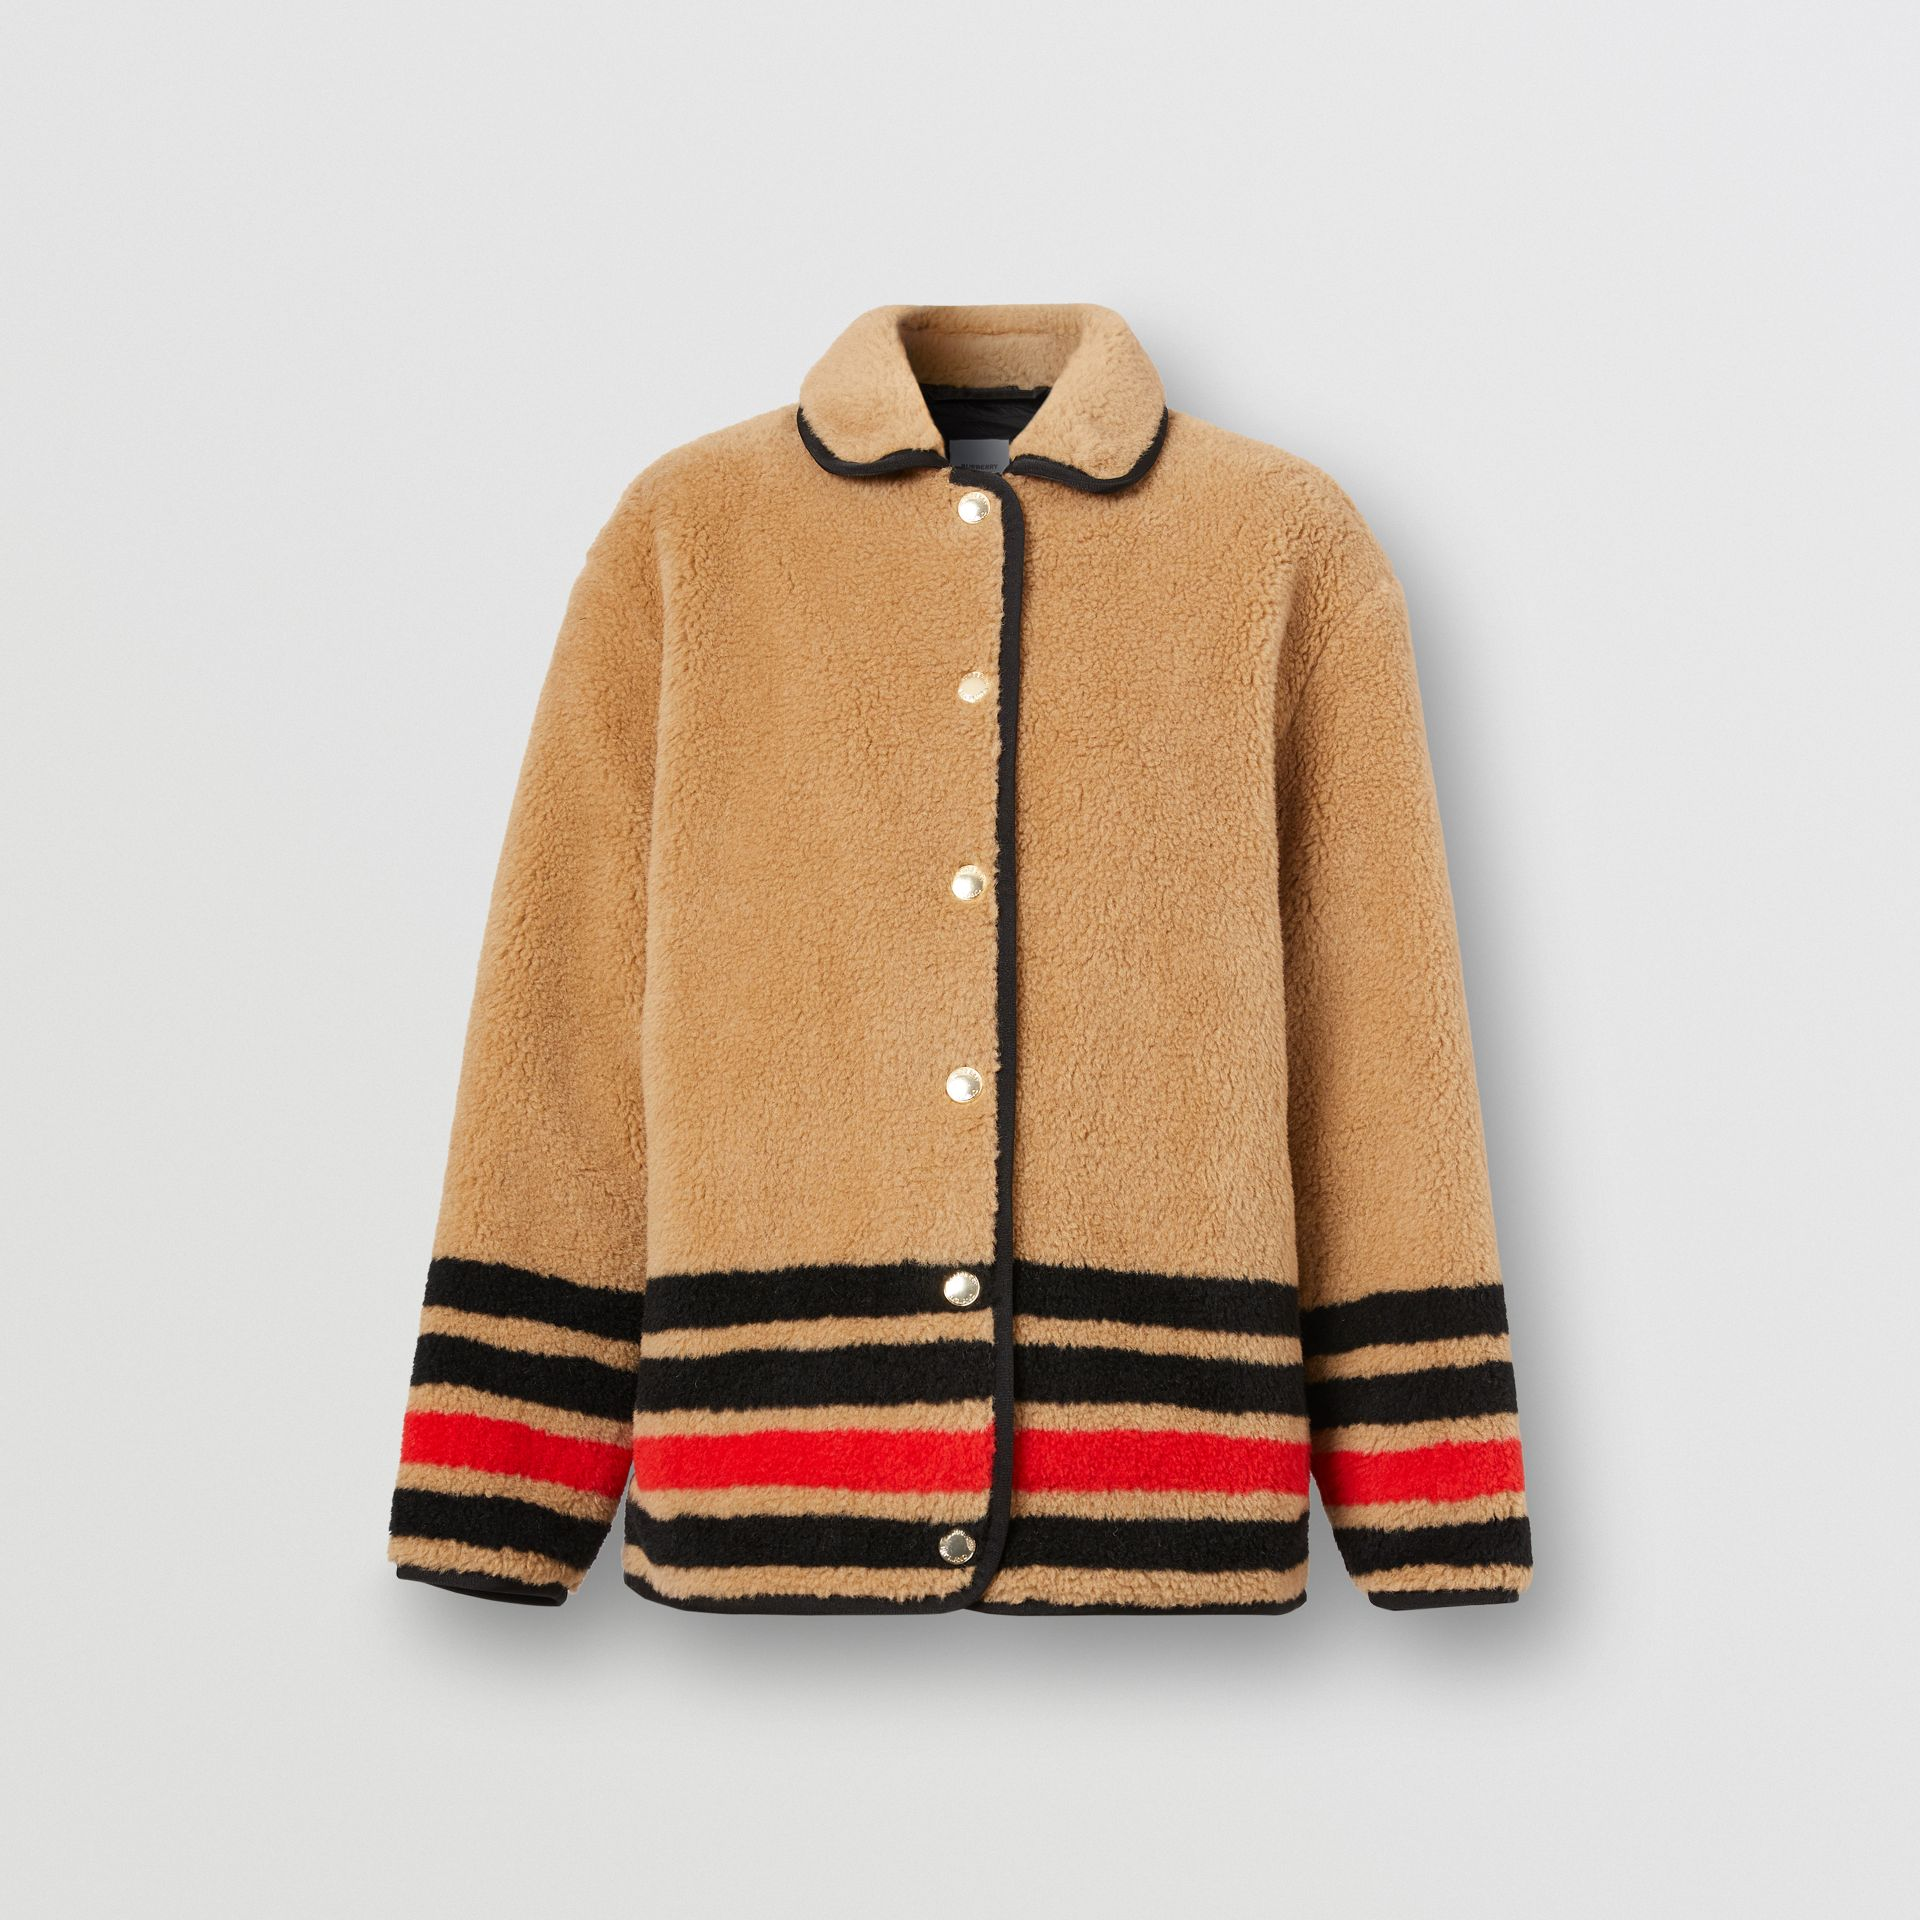 Stripe Intarsia Fleece Jacket in Light Camel - Women | Burberry Canada - gallery image 3